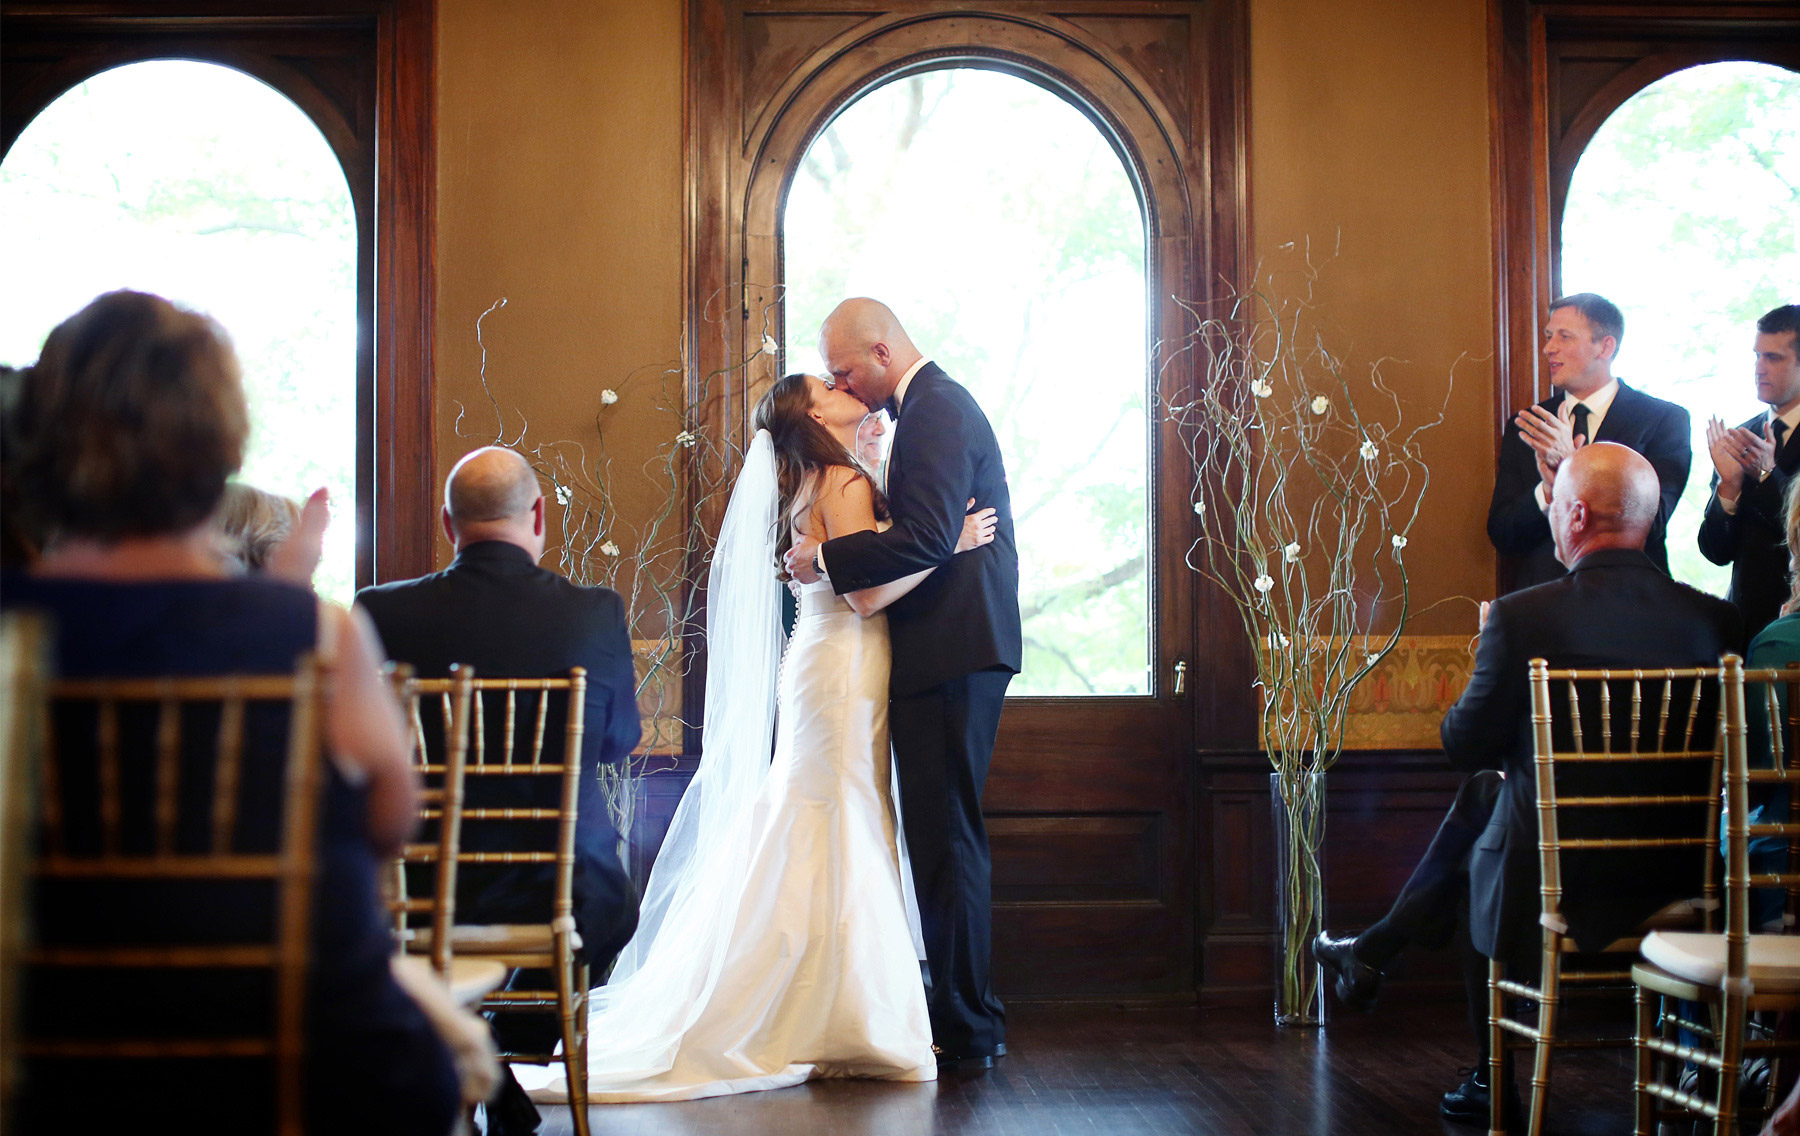 09-Minneapolis-Minnesota-Wedding-Photography-by-Vick-Photography-Semple-Ceremony-Mansion-Nikki-and-Matt.jpg